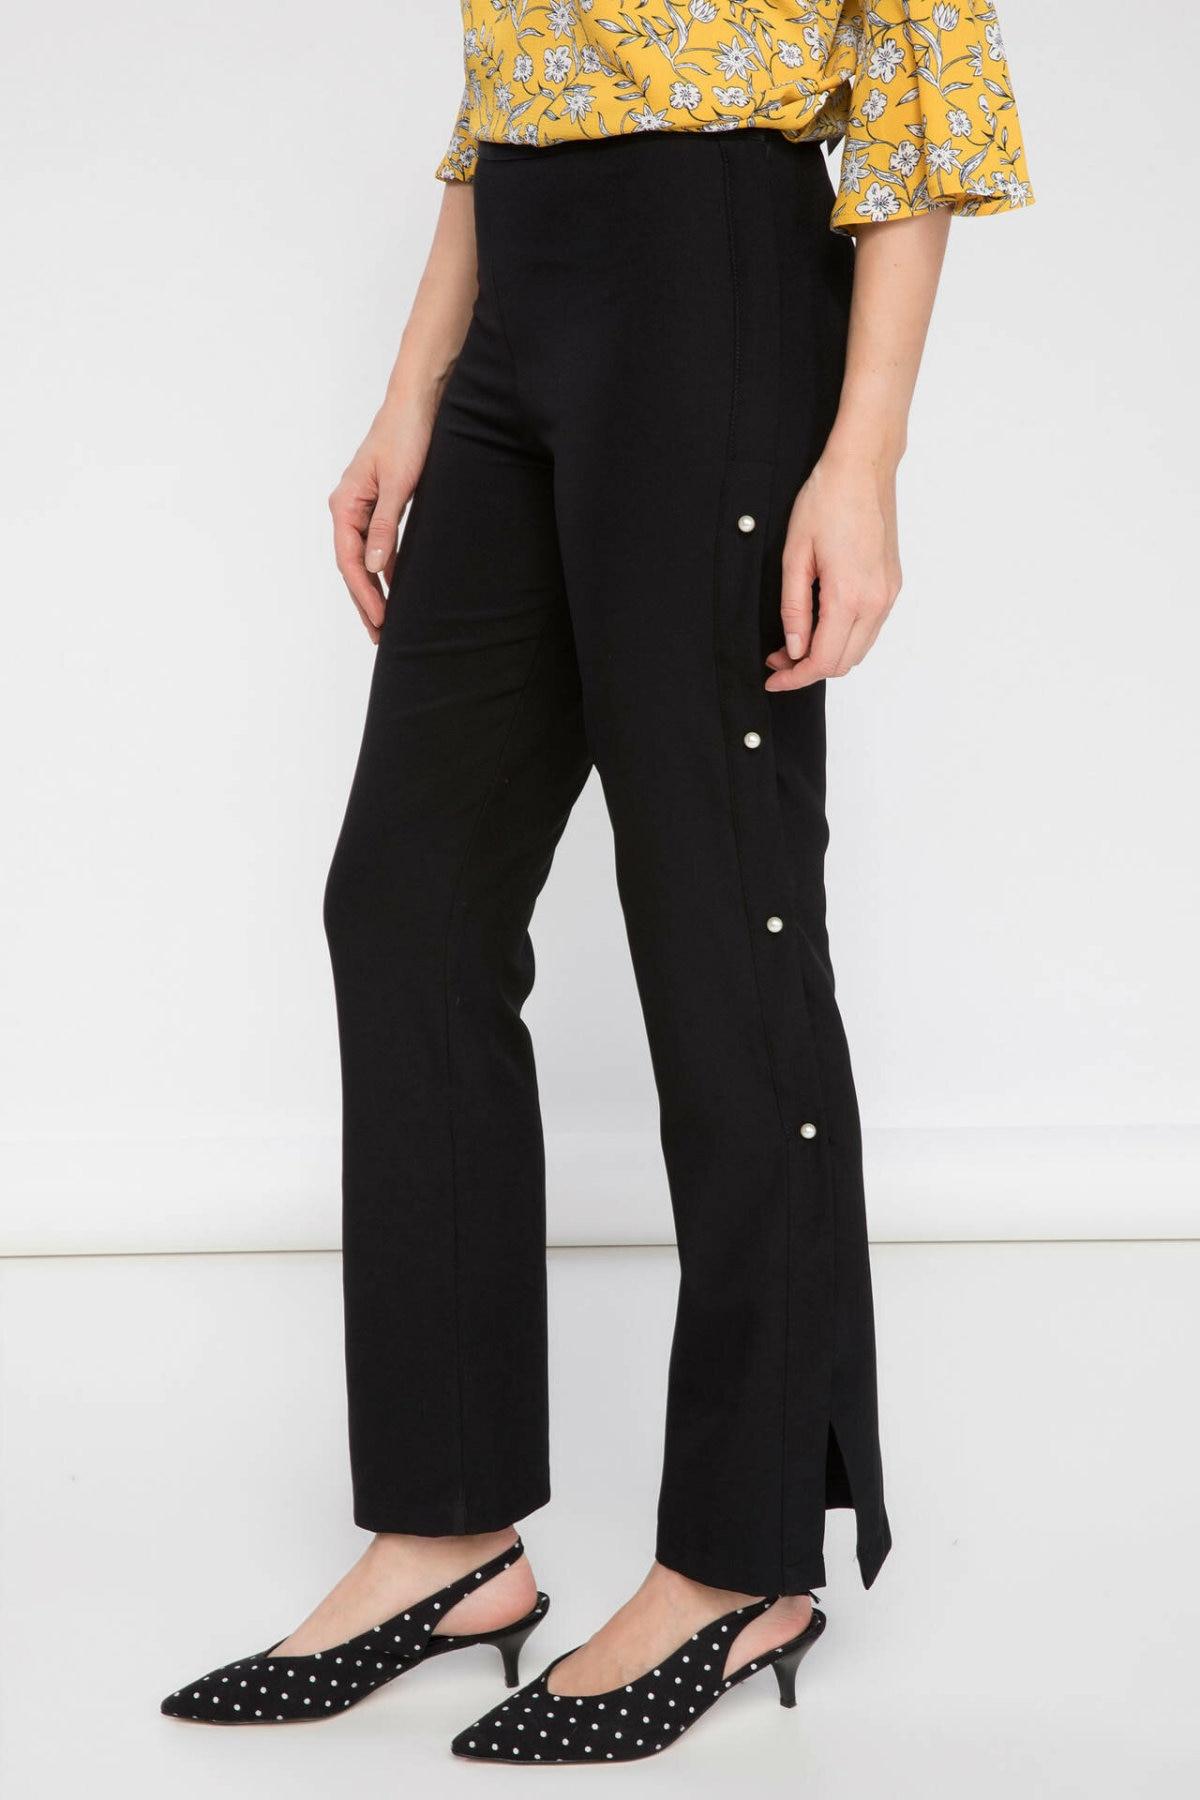 DeFacto Woman Chiffon Black Trousers Black Bell Bottoms Pearl Decors Mid-waist Women Flared Trousers-I2055AZ17AU